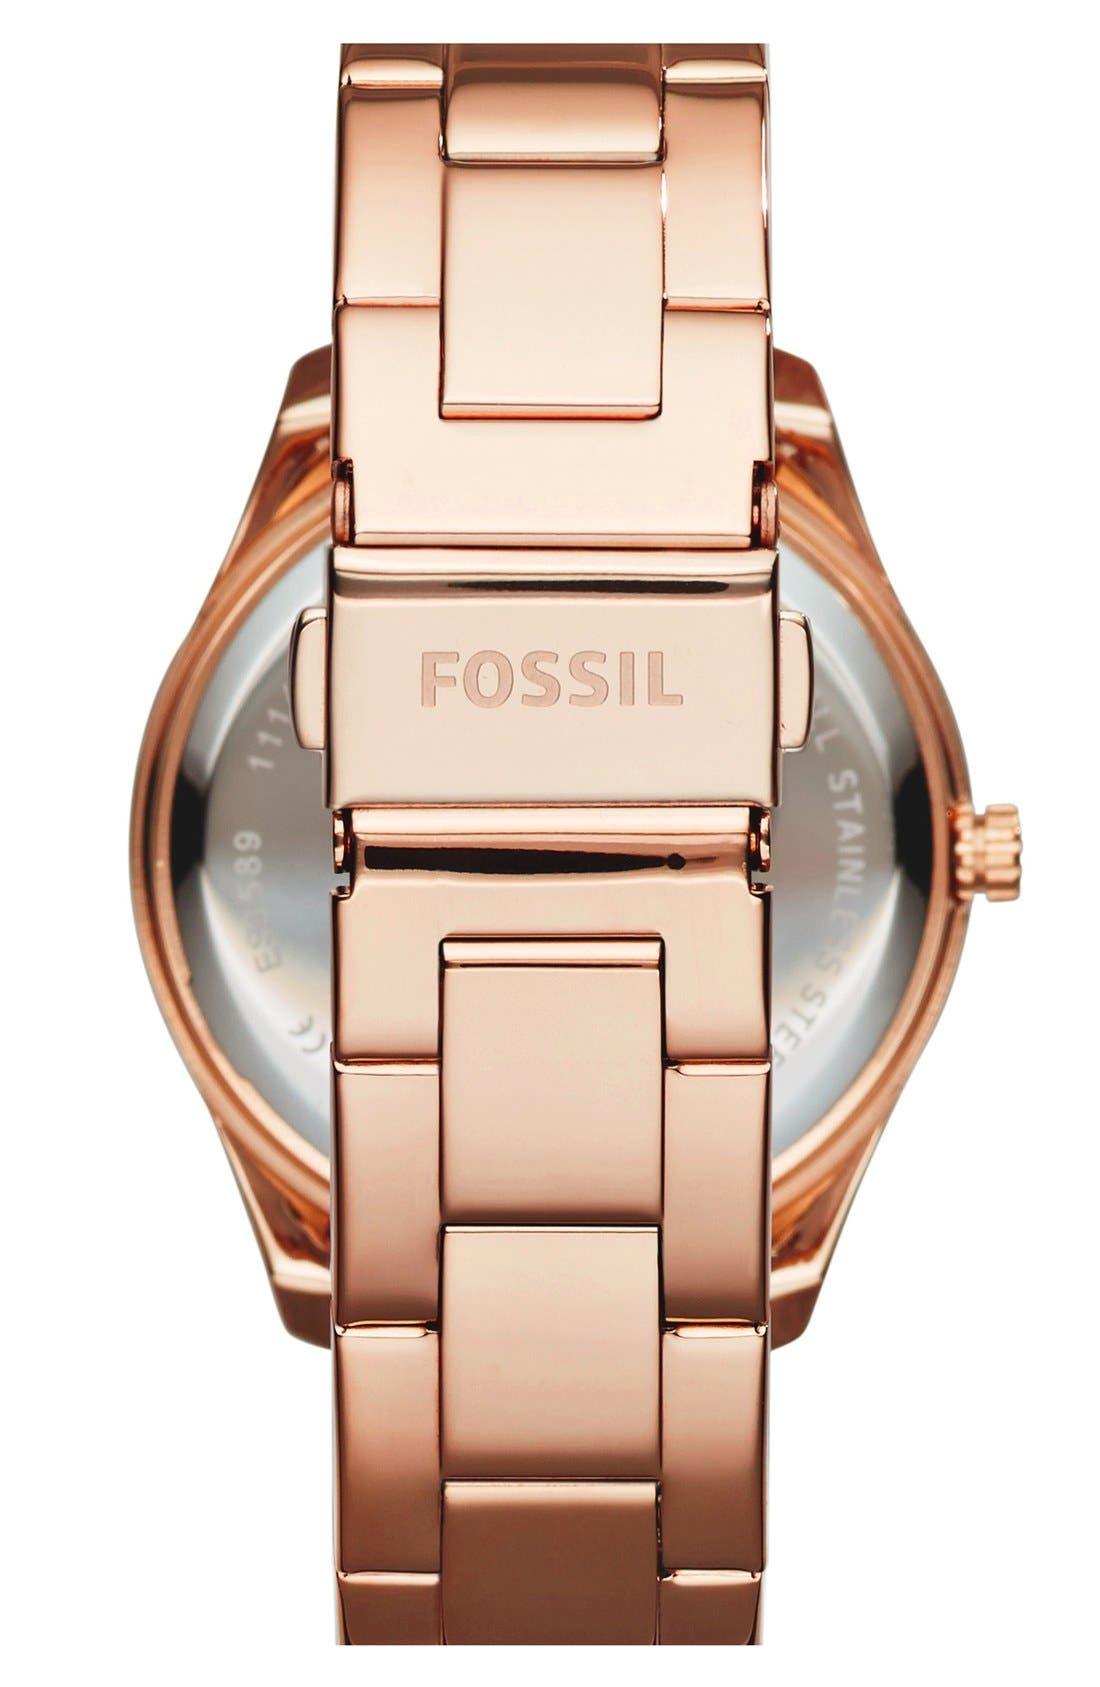 FOSSIL, 'Stella' Crystal Bezel Multifunction Bracelet Watch, 38mm, Alternate thumbnail 2, color, ROSE GOLD